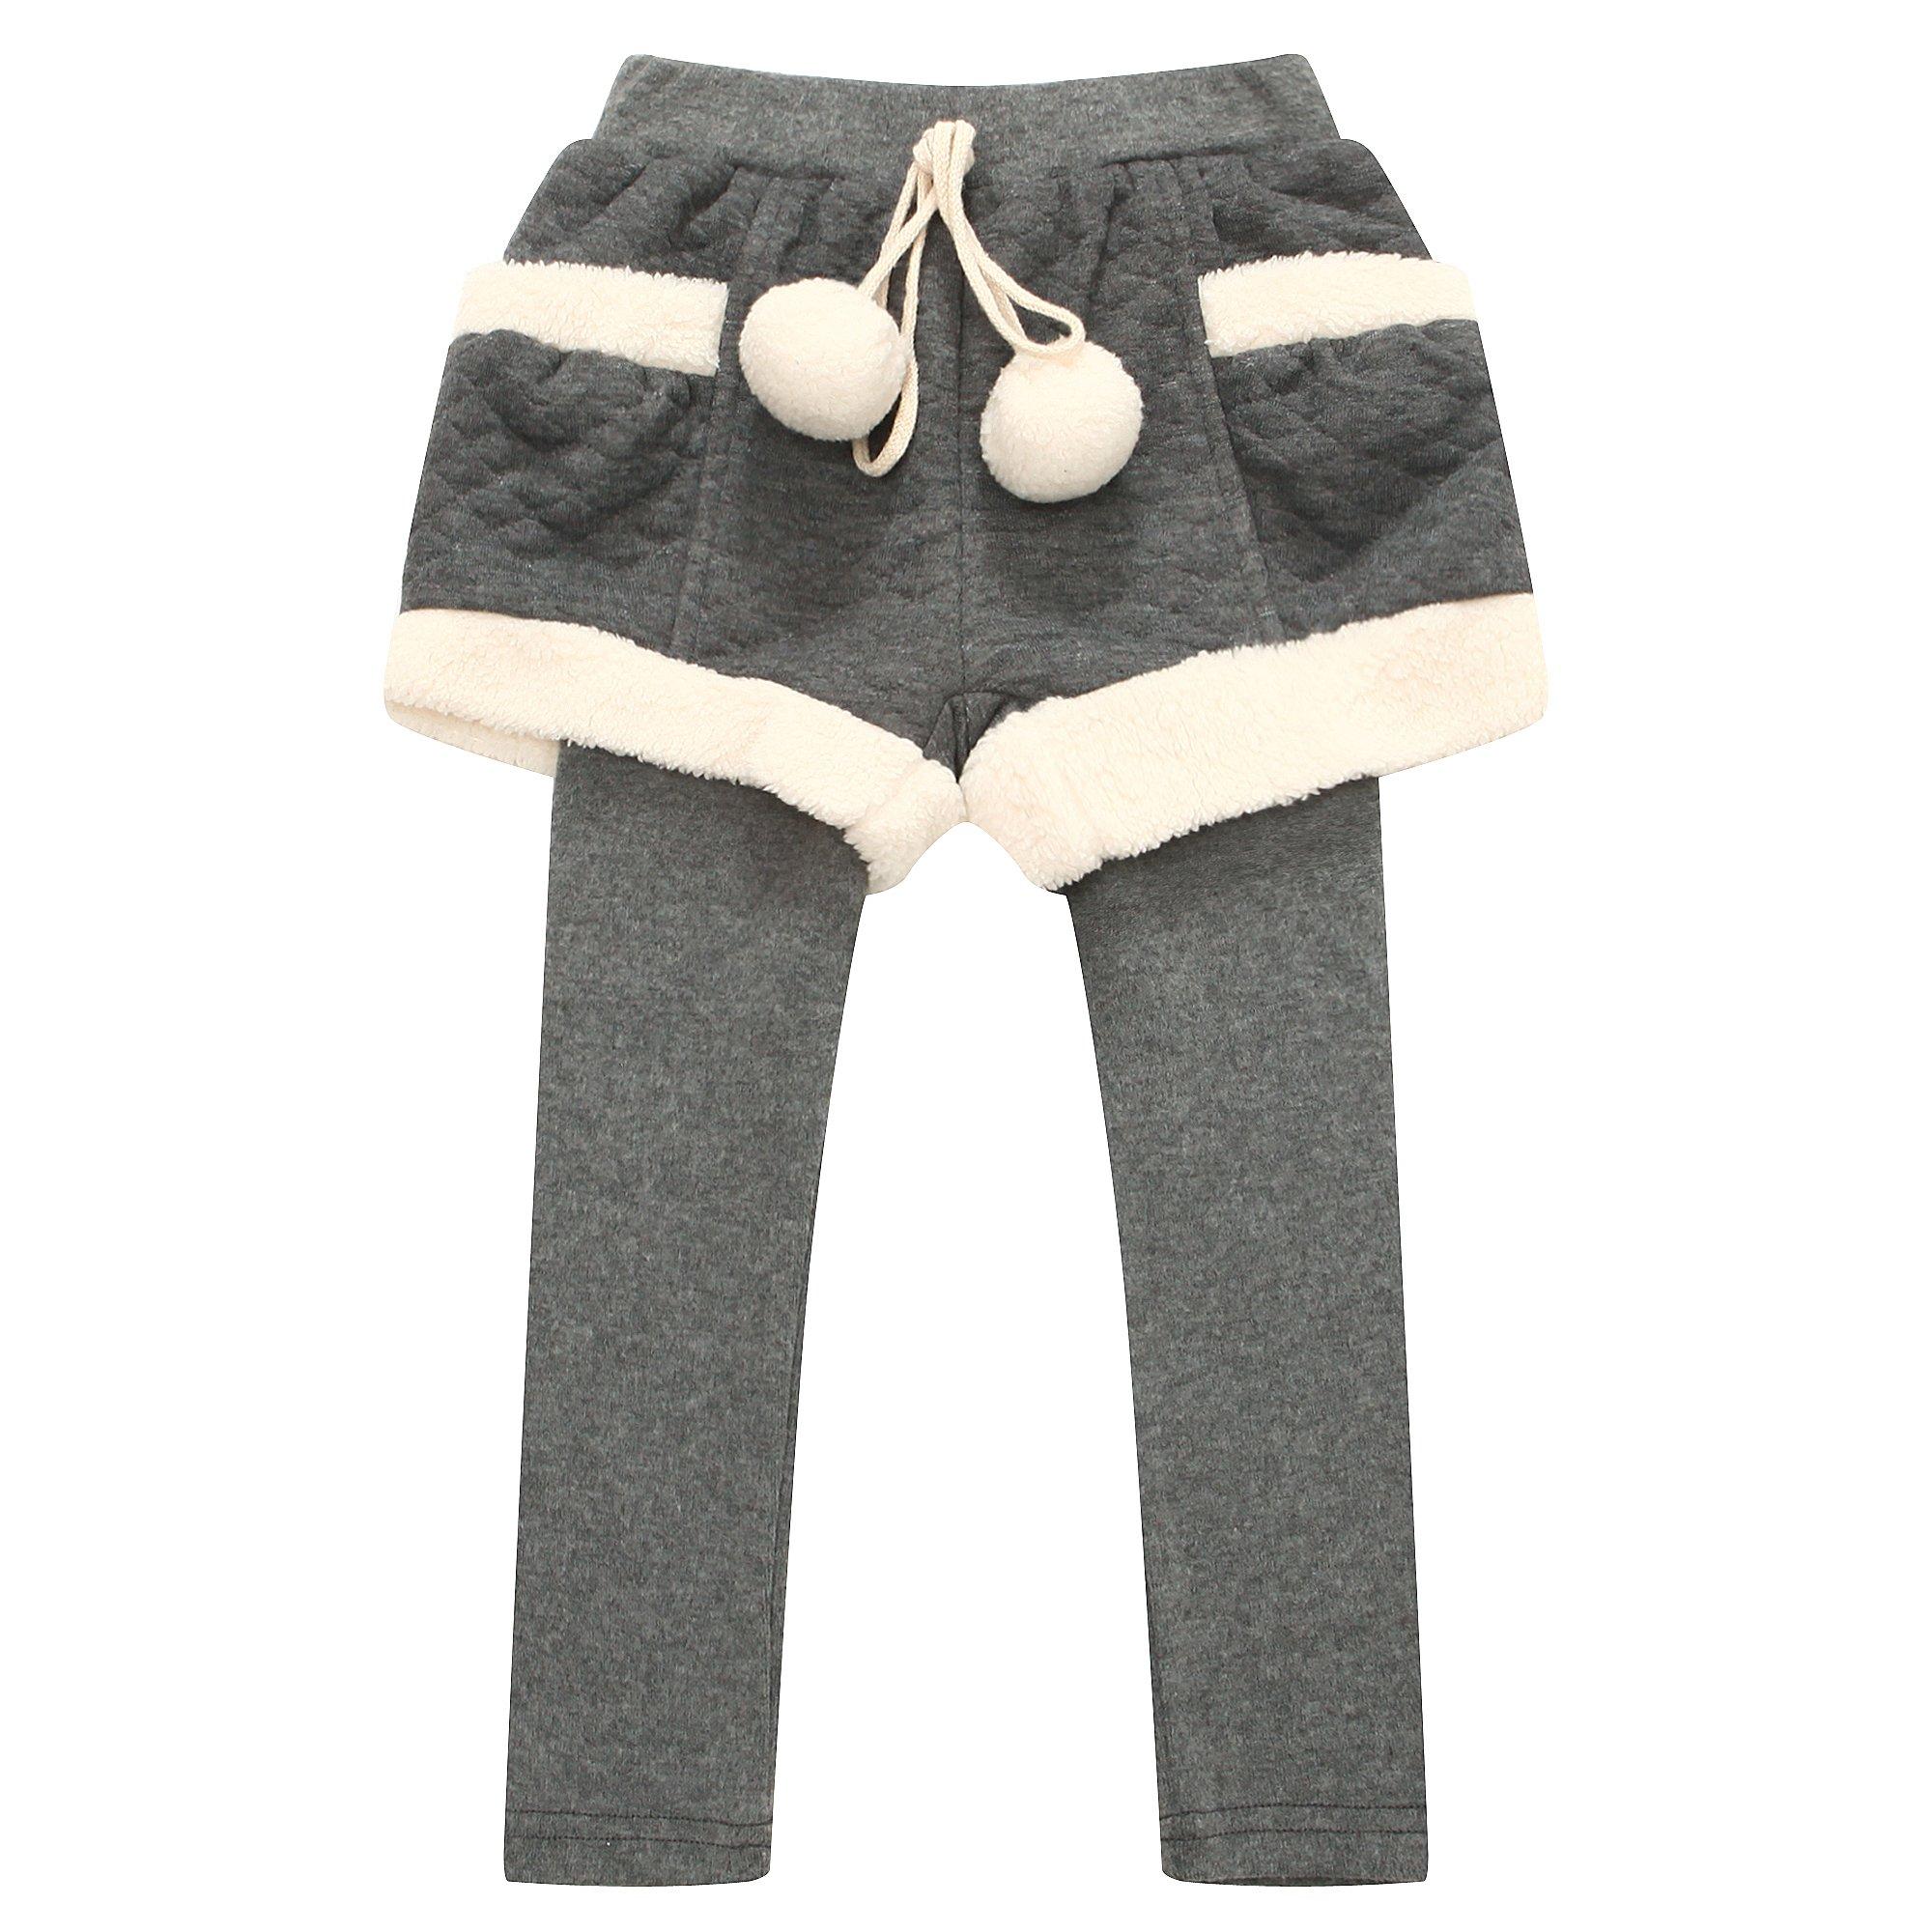 Richie House Little Girls' Leggings with Shorts RH0902-C-5/6